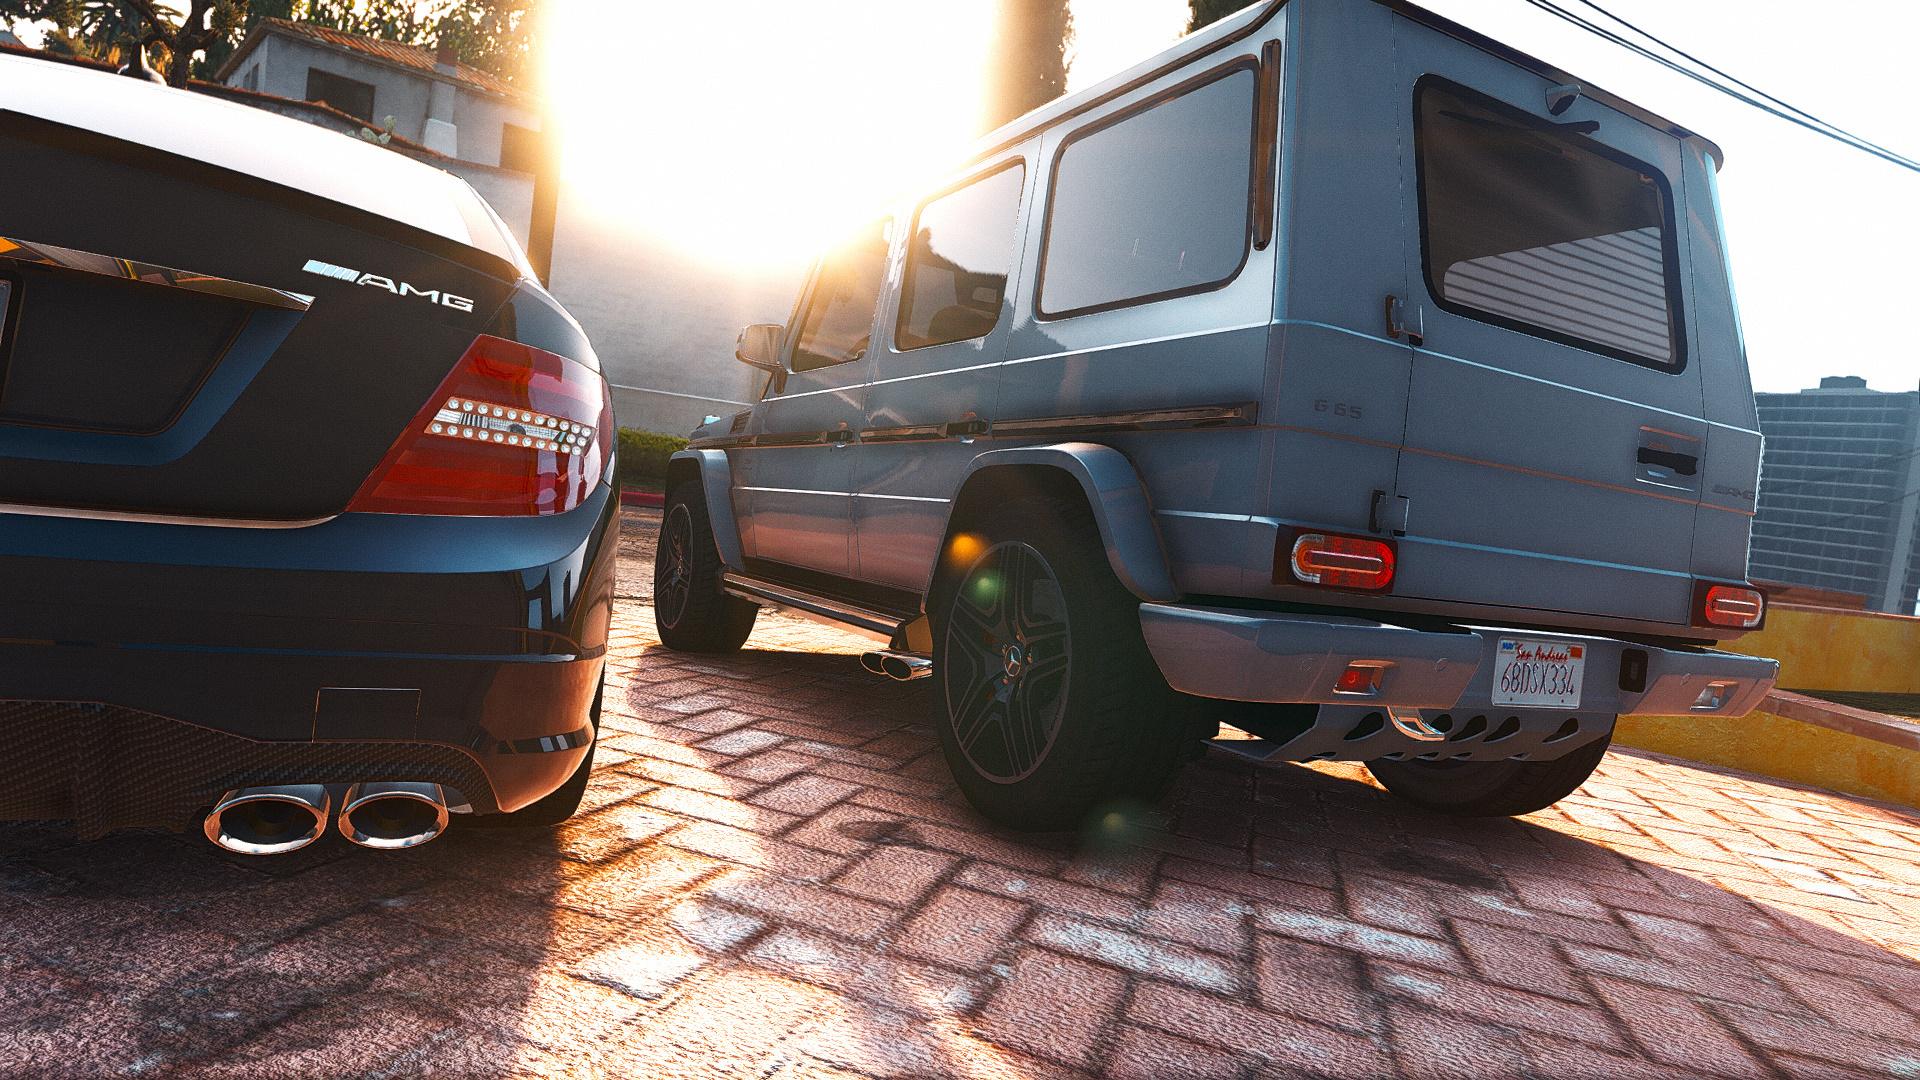 ba0200 gta5 2016 04 02 17 17 24 998 - Mercedes G65 Amg 66